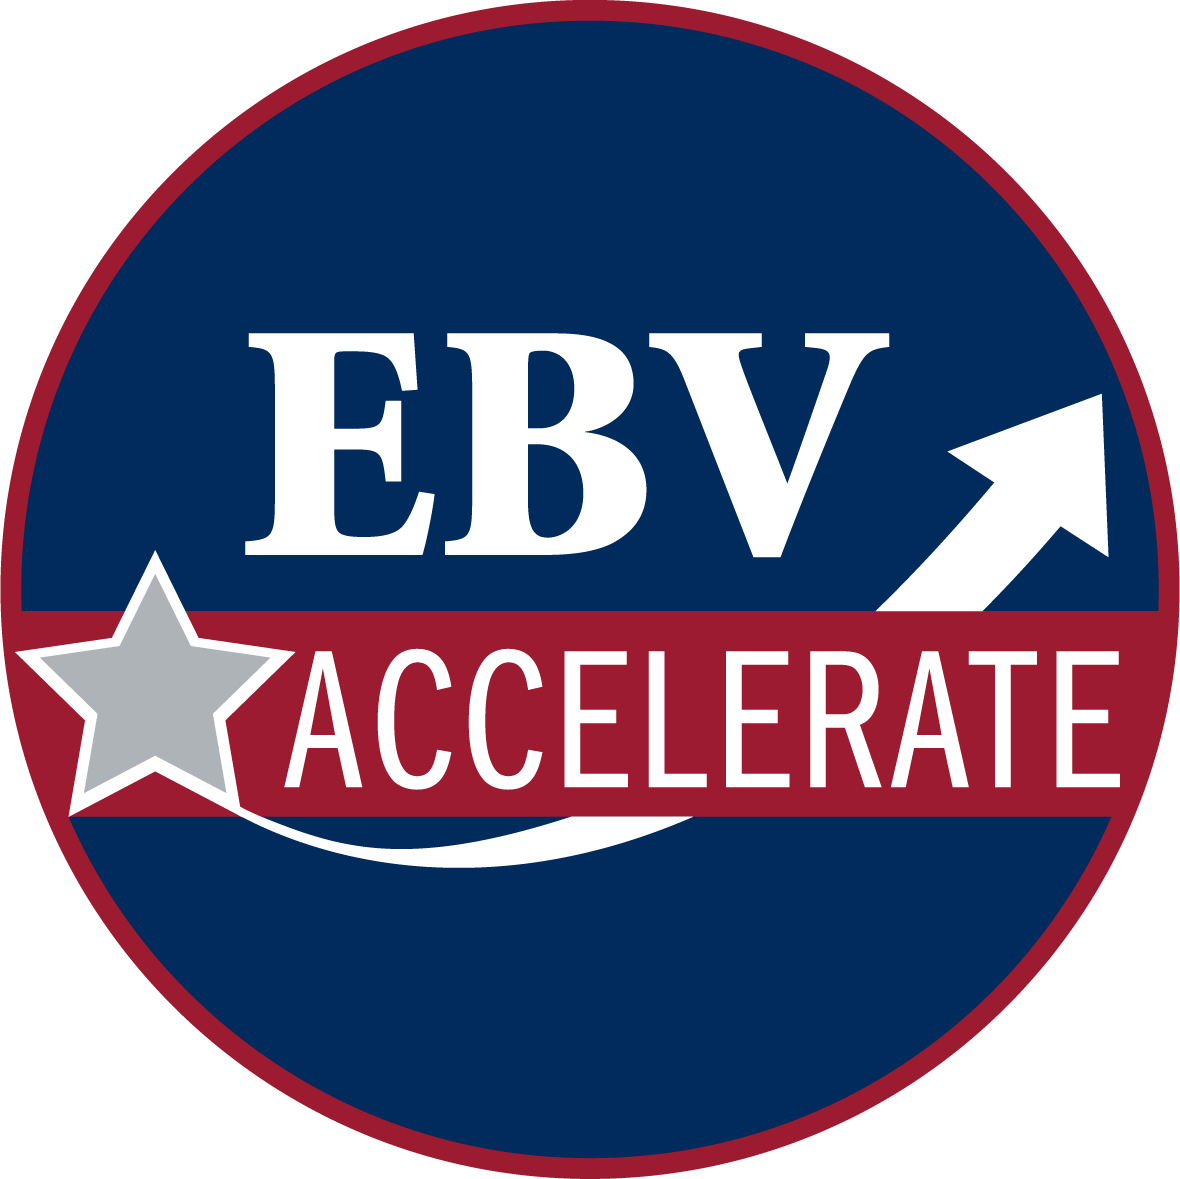 ebv accelerate logo